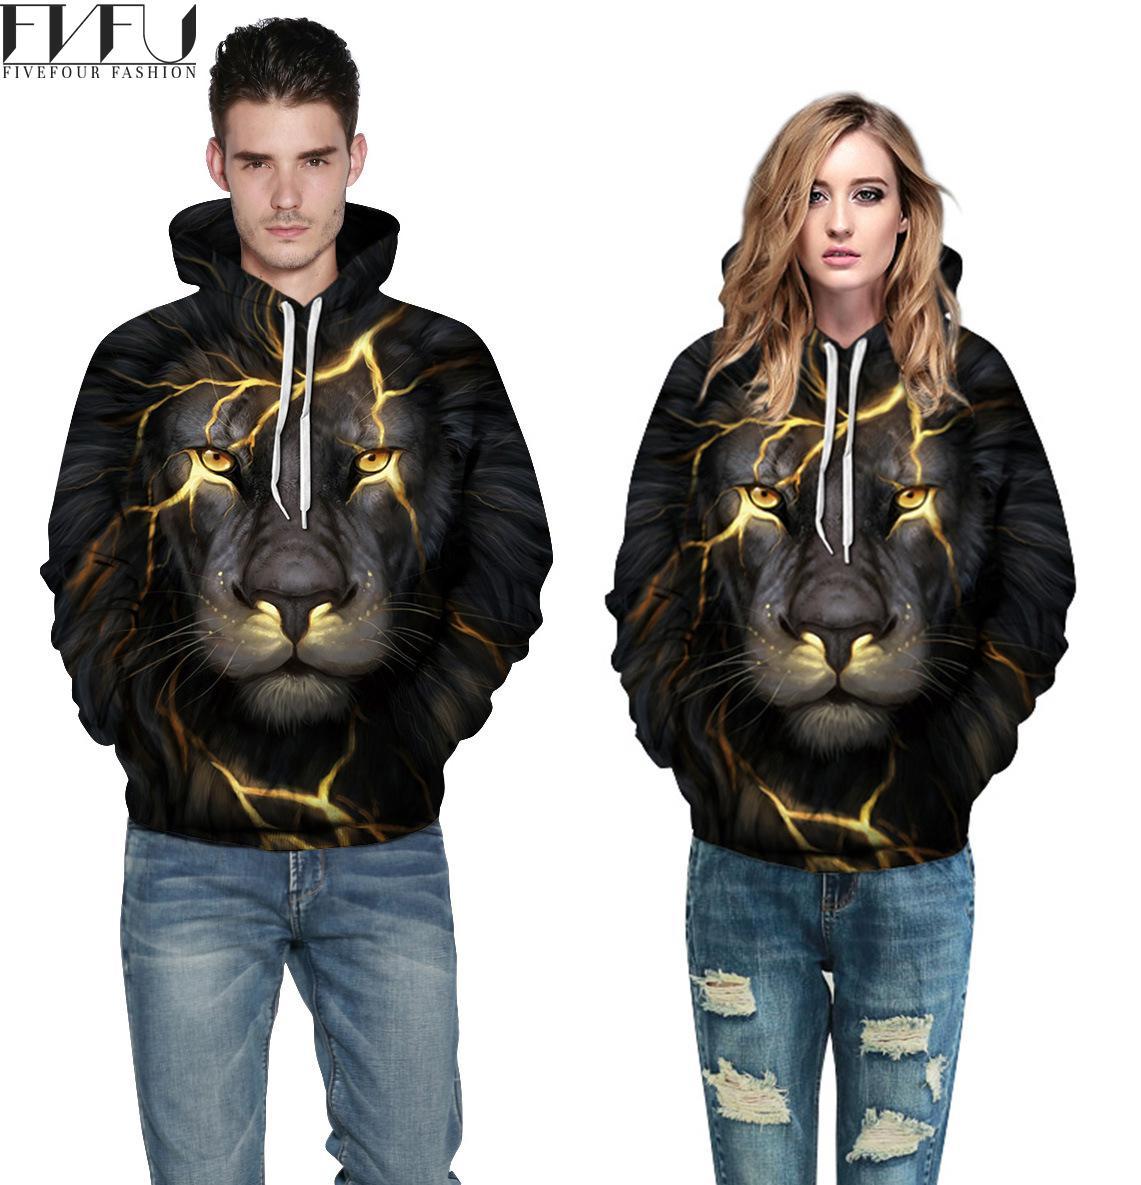 Fashion 2018 Hoodies Sweatshirt Women/men Couples Tops Halloween Hoodies Harajuku Lion 3D Print Black Casual Hoodies Plus Size